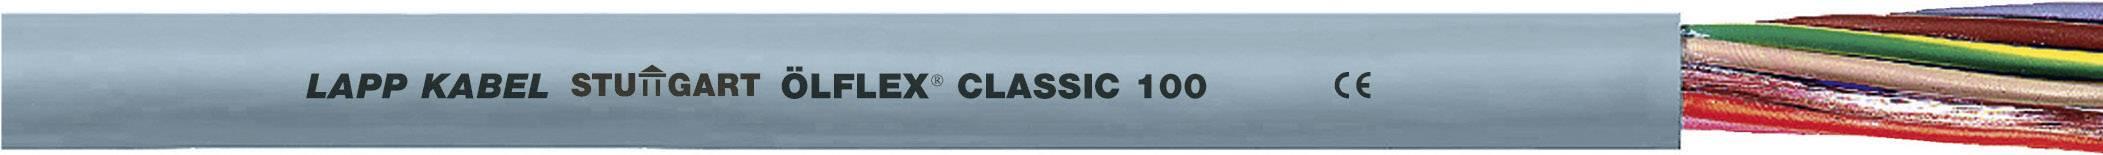 Kabel LappKabel Ölflex CLASSIC 100 16G1 (0010052), PVC, 11,8 mm, 500 V, šedá, 50 m